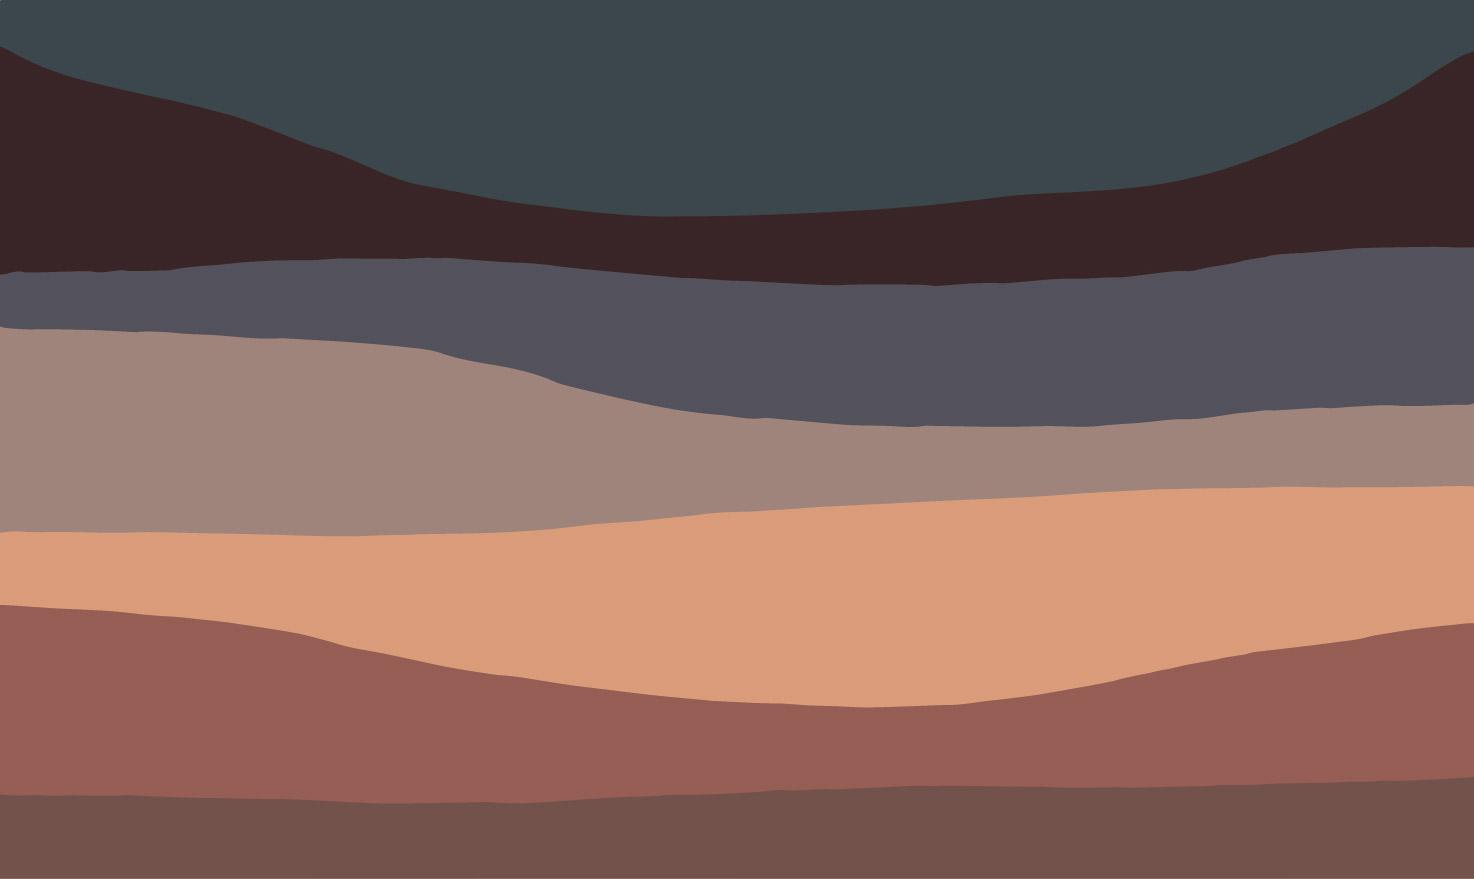 B4502_MONDI-PARALLELI-(AQUA)_BLUE-BLACK-BROWN_LR.jpg